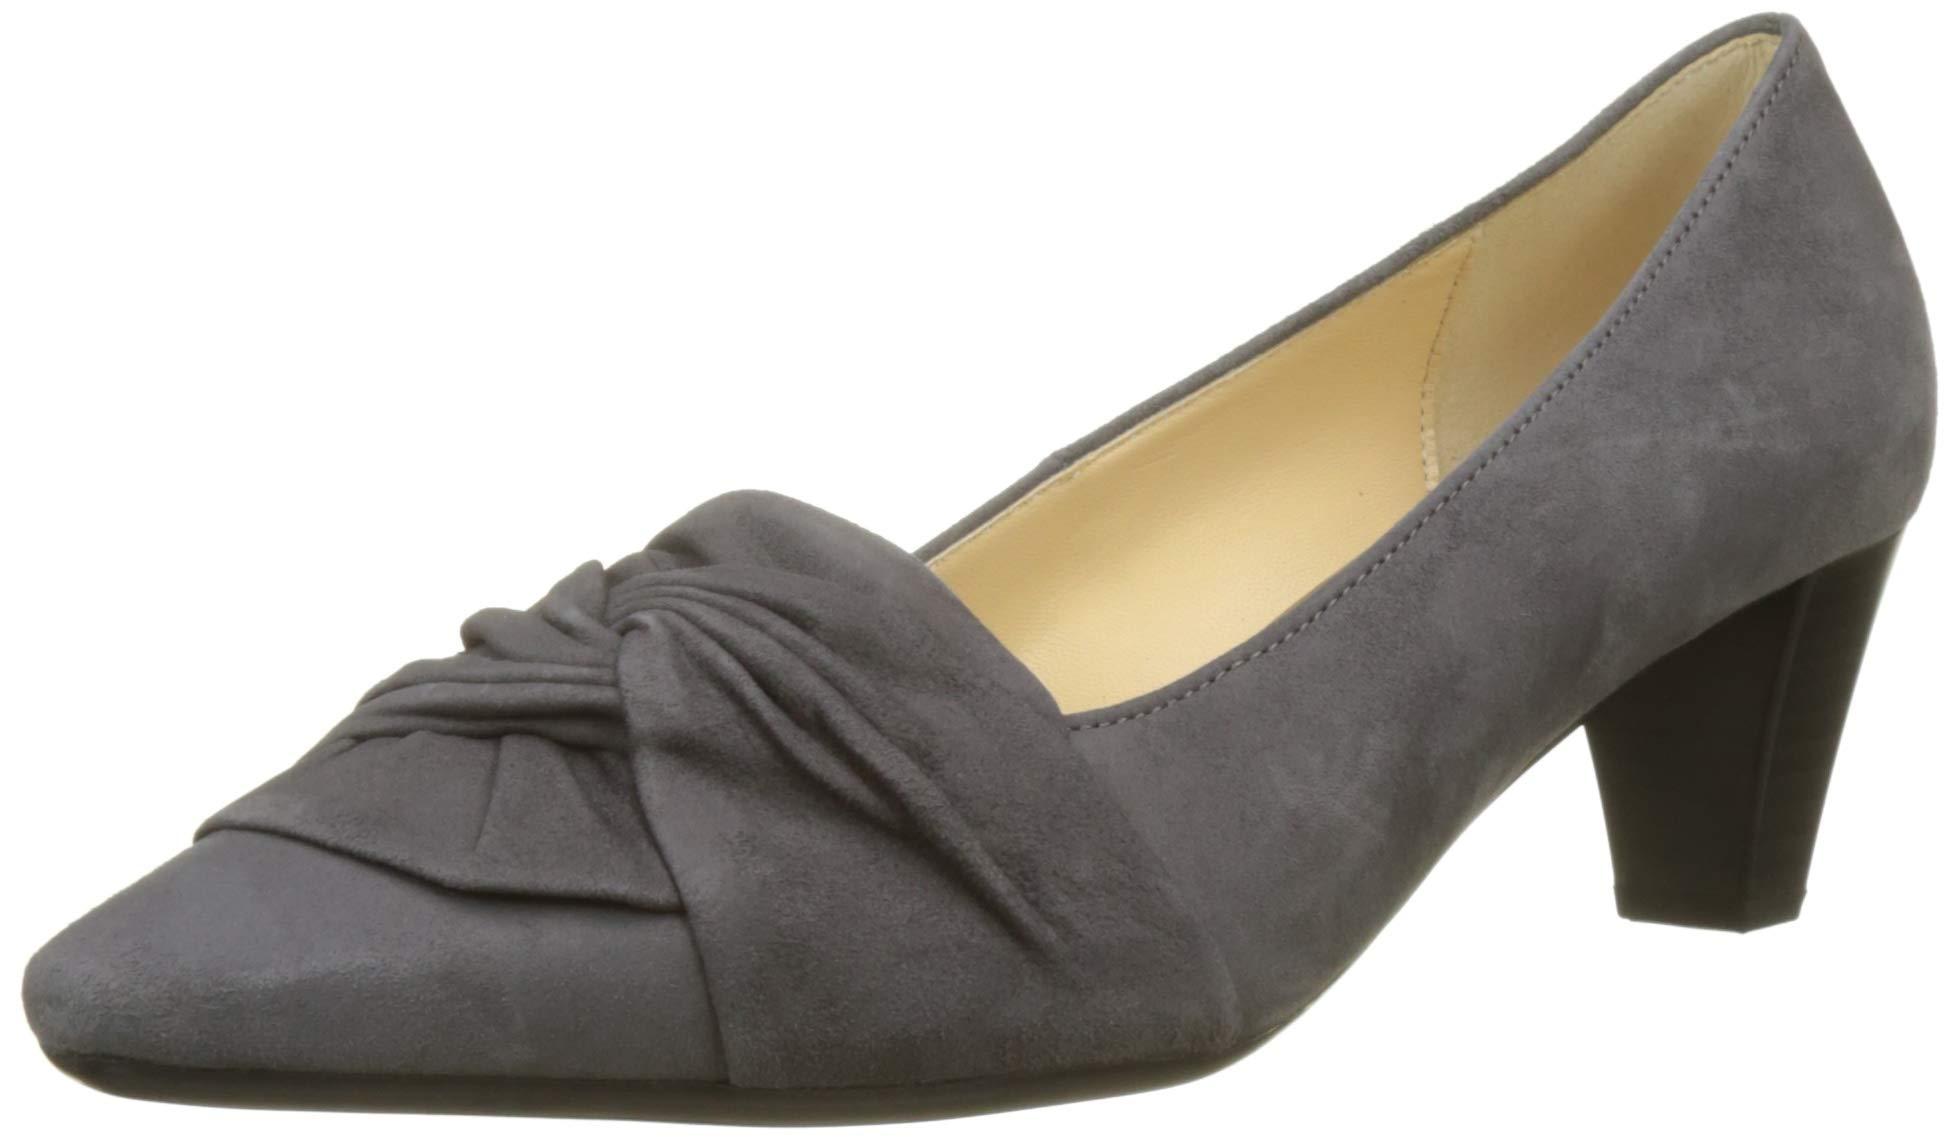 grey FemmeGrisdark 1938 Gabor BasicEscarpins Shoes Eu W2IH9eDEY